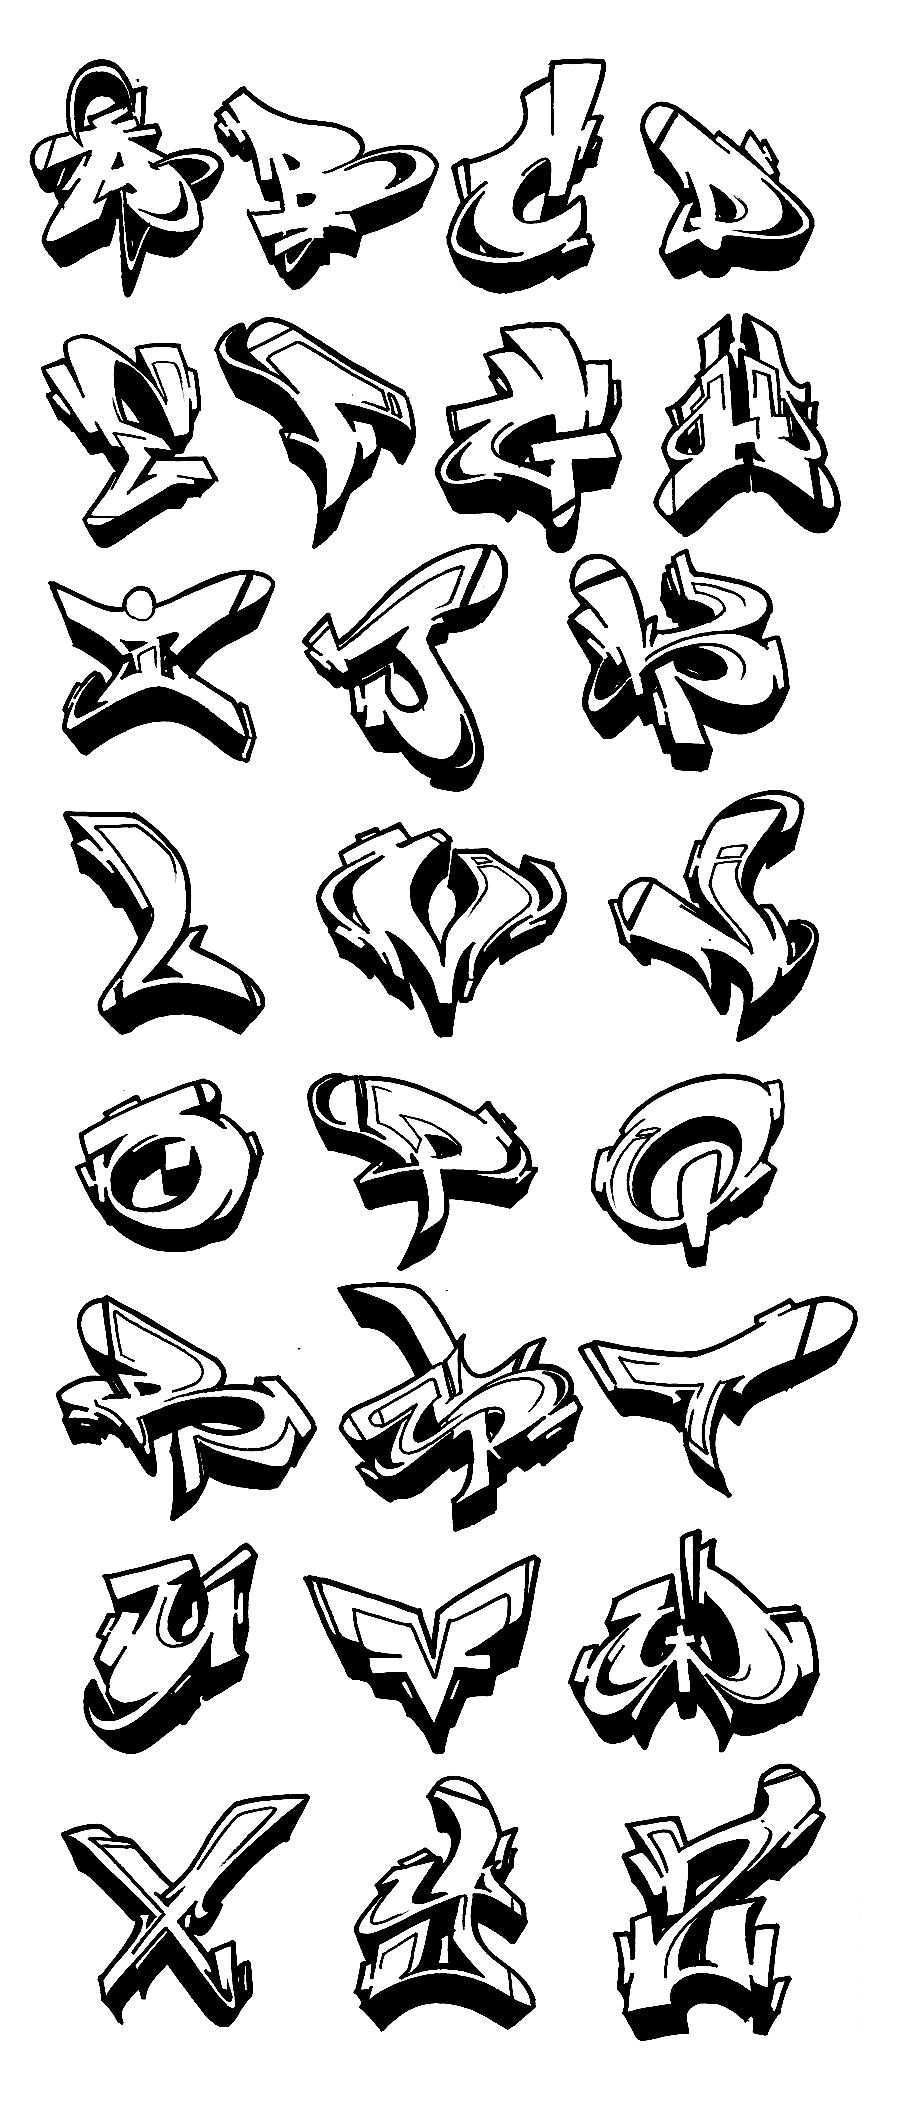 Graffiti Alphabet Wildstyle A Z 3d Graffiti Collection Graffiti Art Letters Graffiti Alphabet Graffiti Alphabet Styles